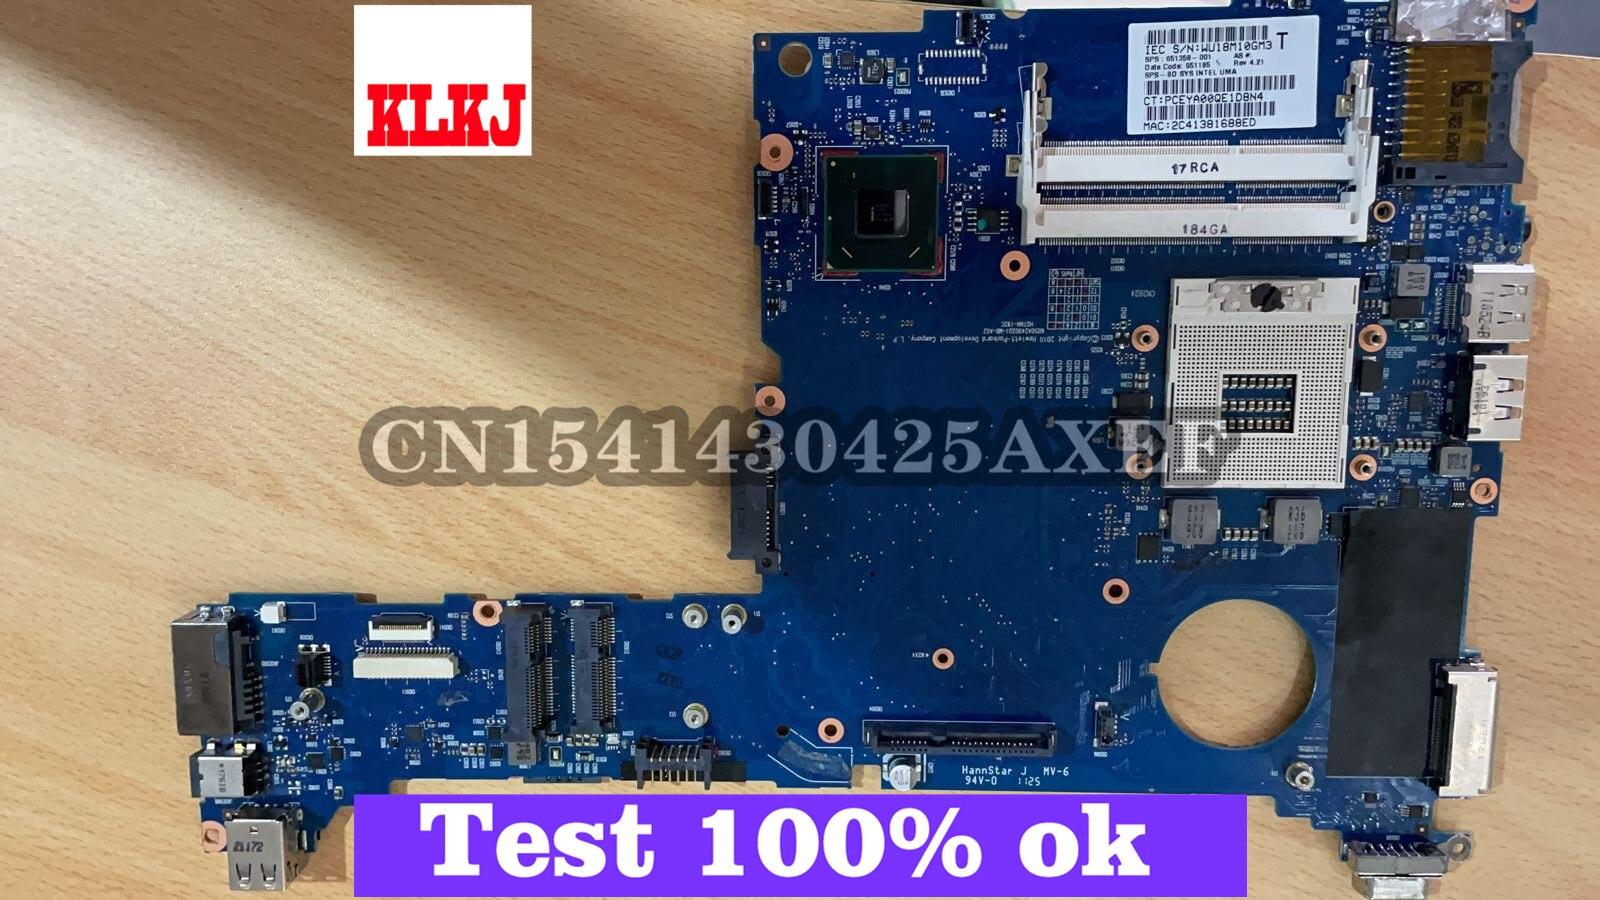 KLKJ 6050A2400201-MB-A02 لوحة رئيسية لأجهزة HP الكمبيوتر المحمول EliteBook 2560P اللوحة الرئيسية الأصلية QM67